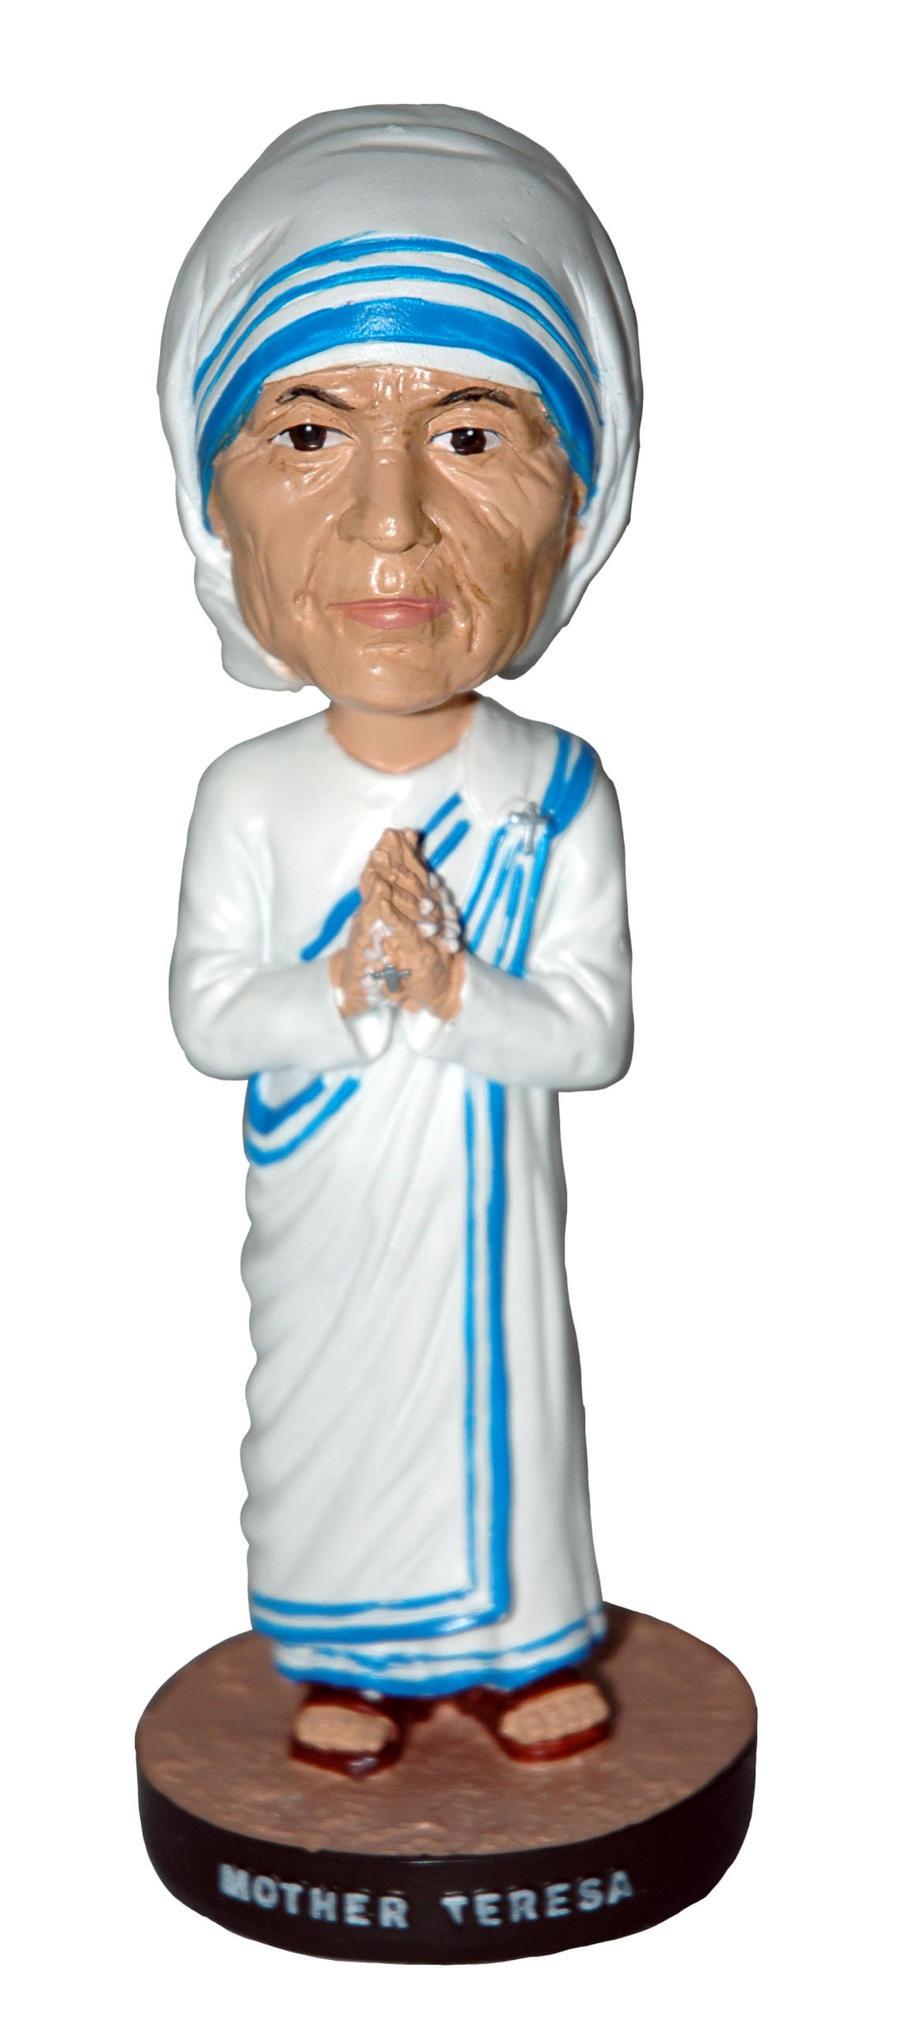 Mother Teresa Figurine By Thebobblehead On Deviantart